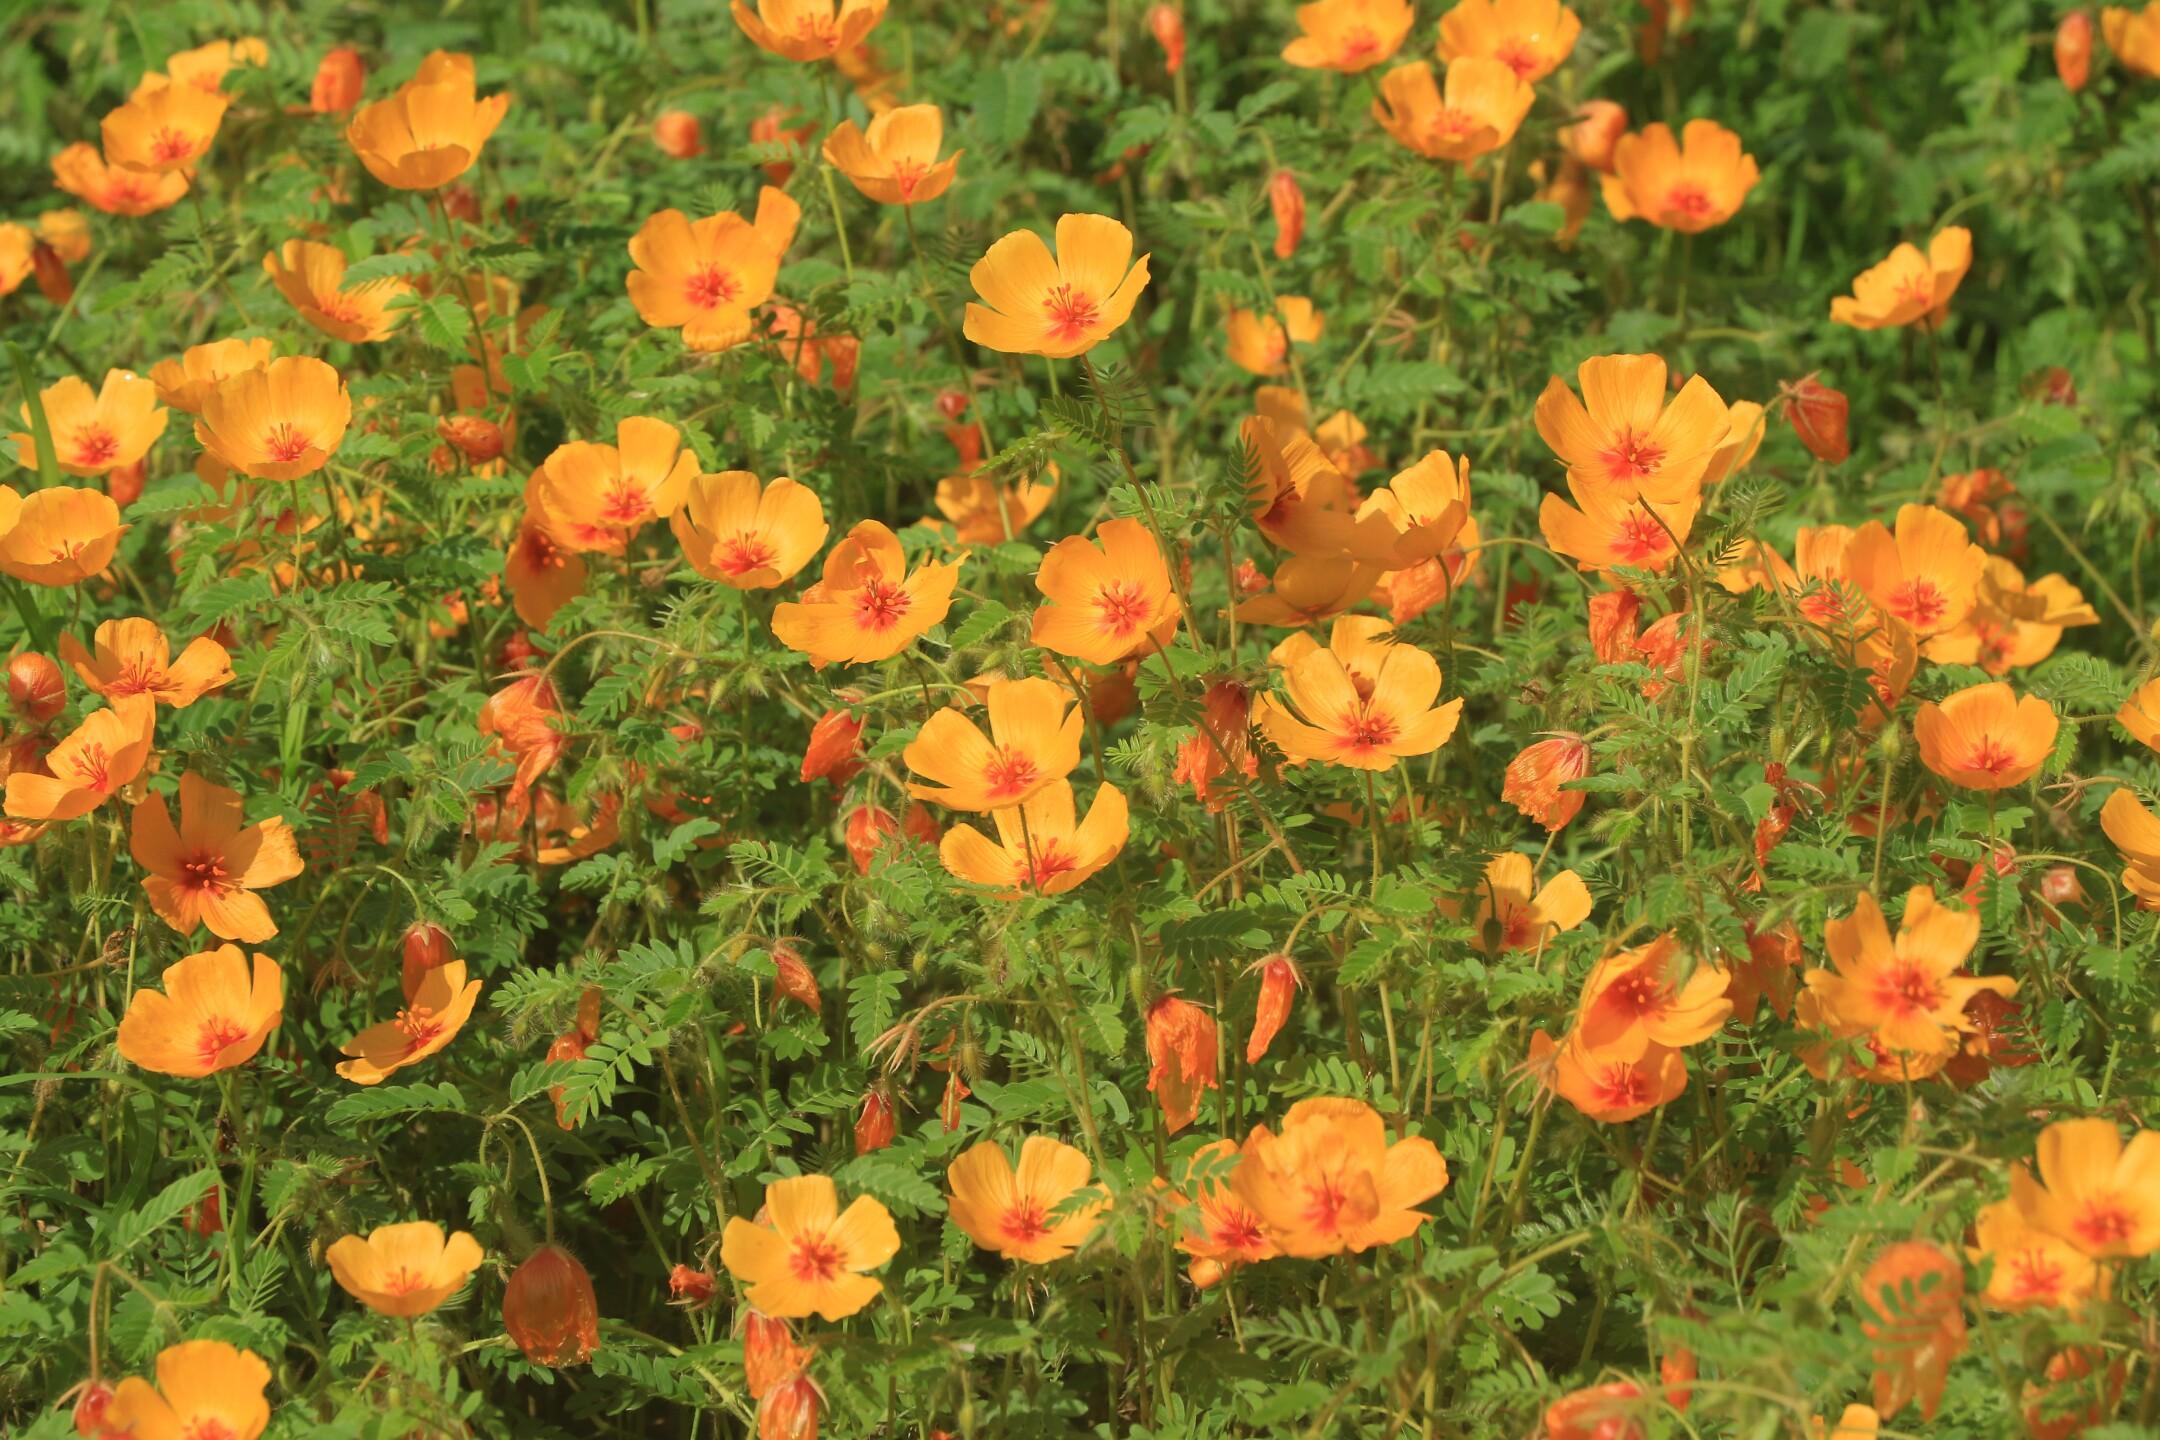 Monsoon rains bring forth poppies